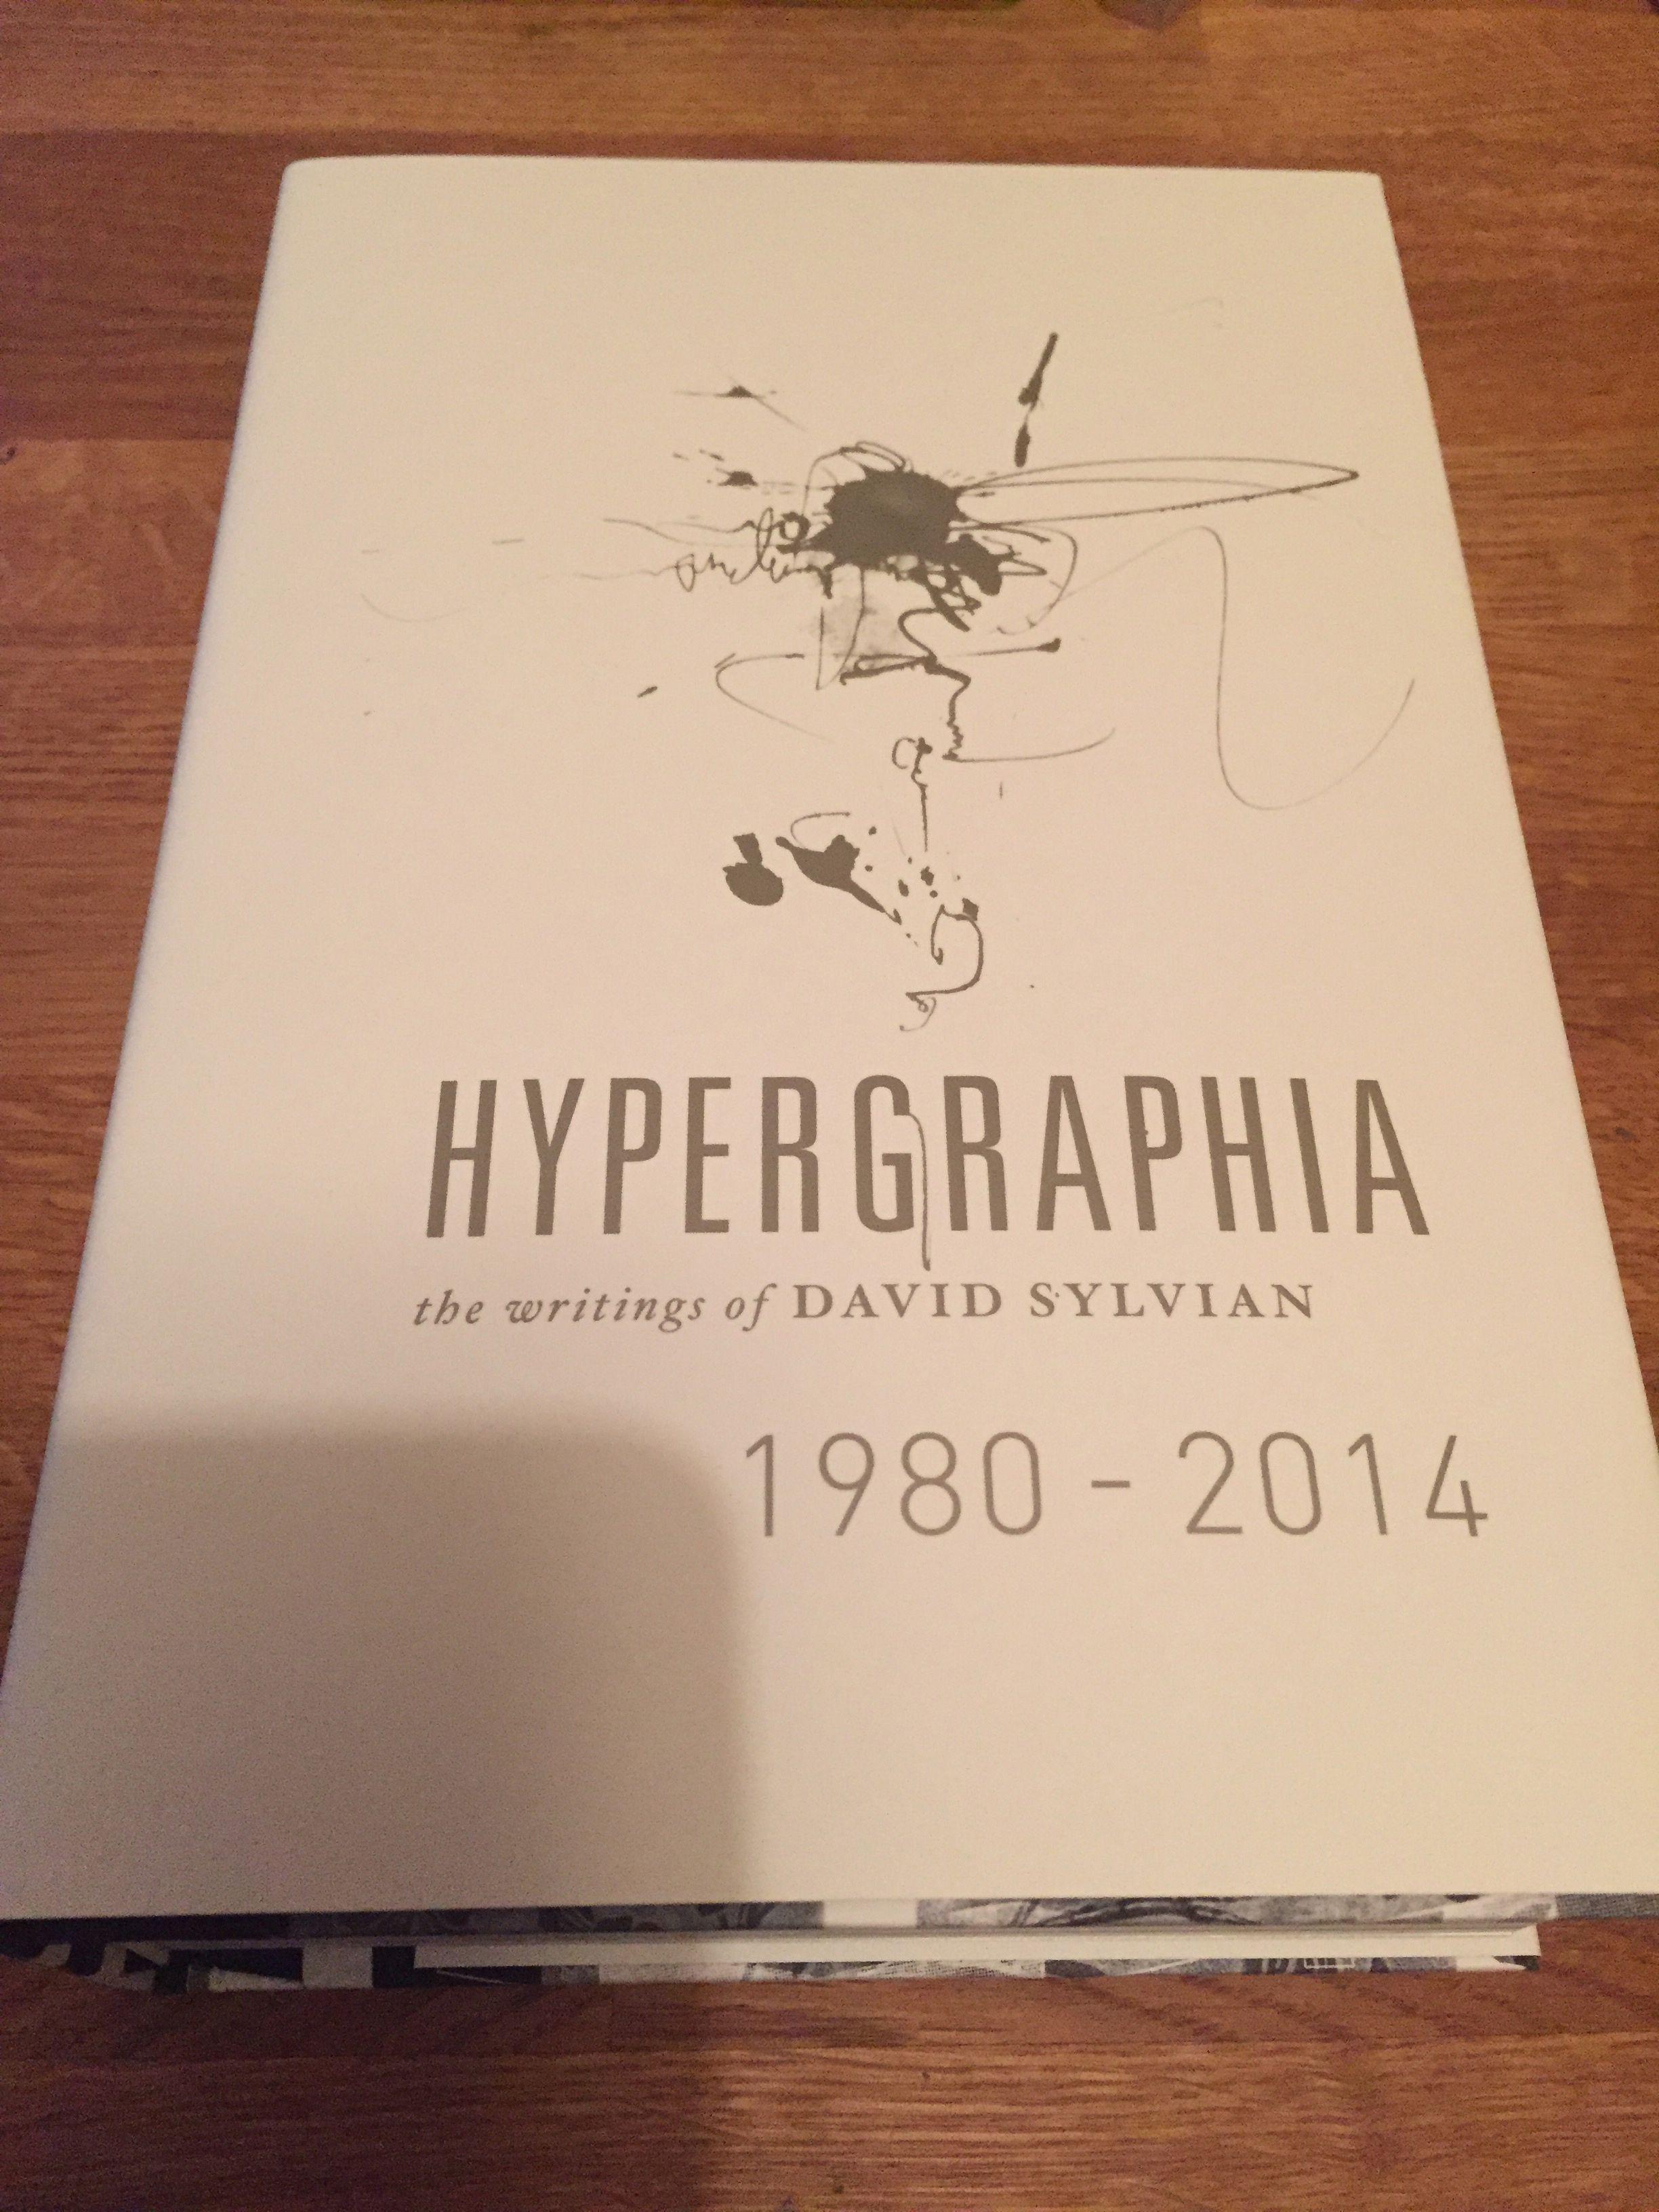 Hypergraphia by David Sylvian